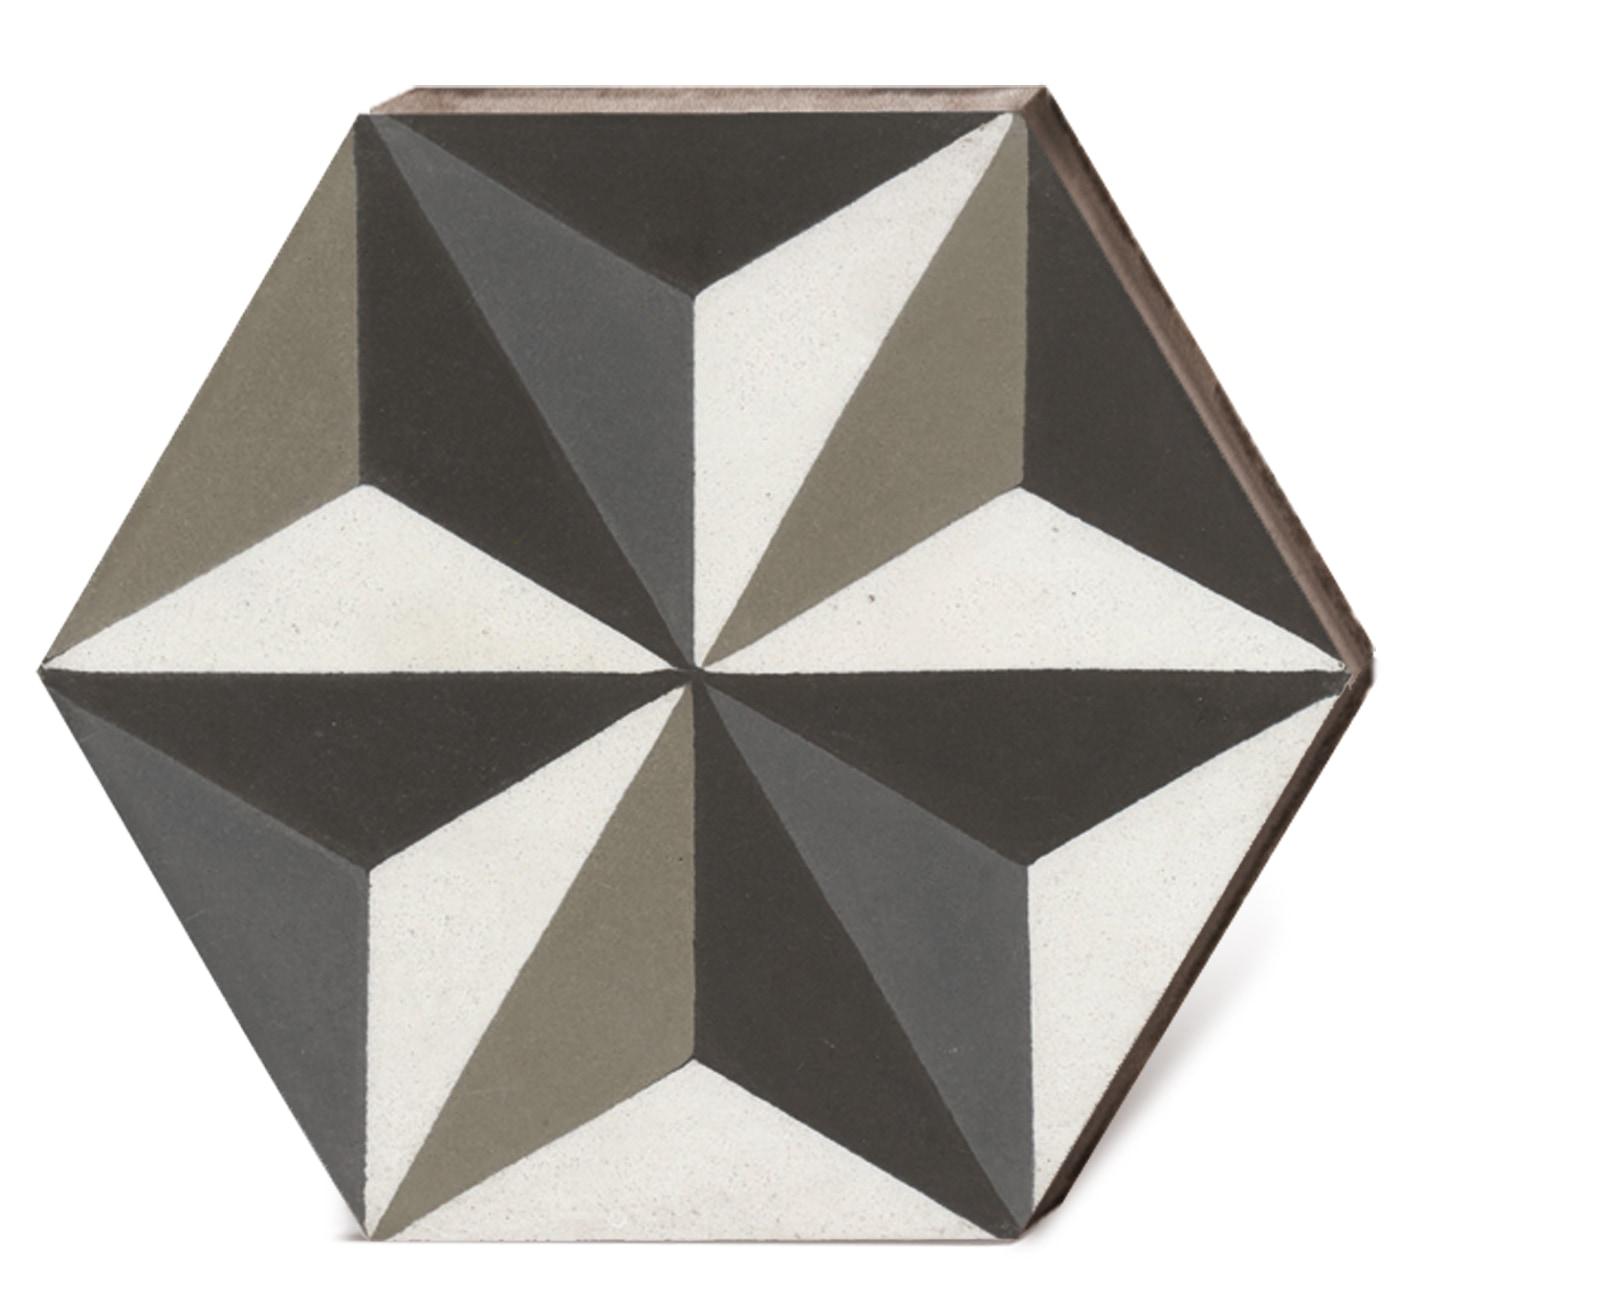 zementmosaikplatte-nummer-600760-via-gmbh